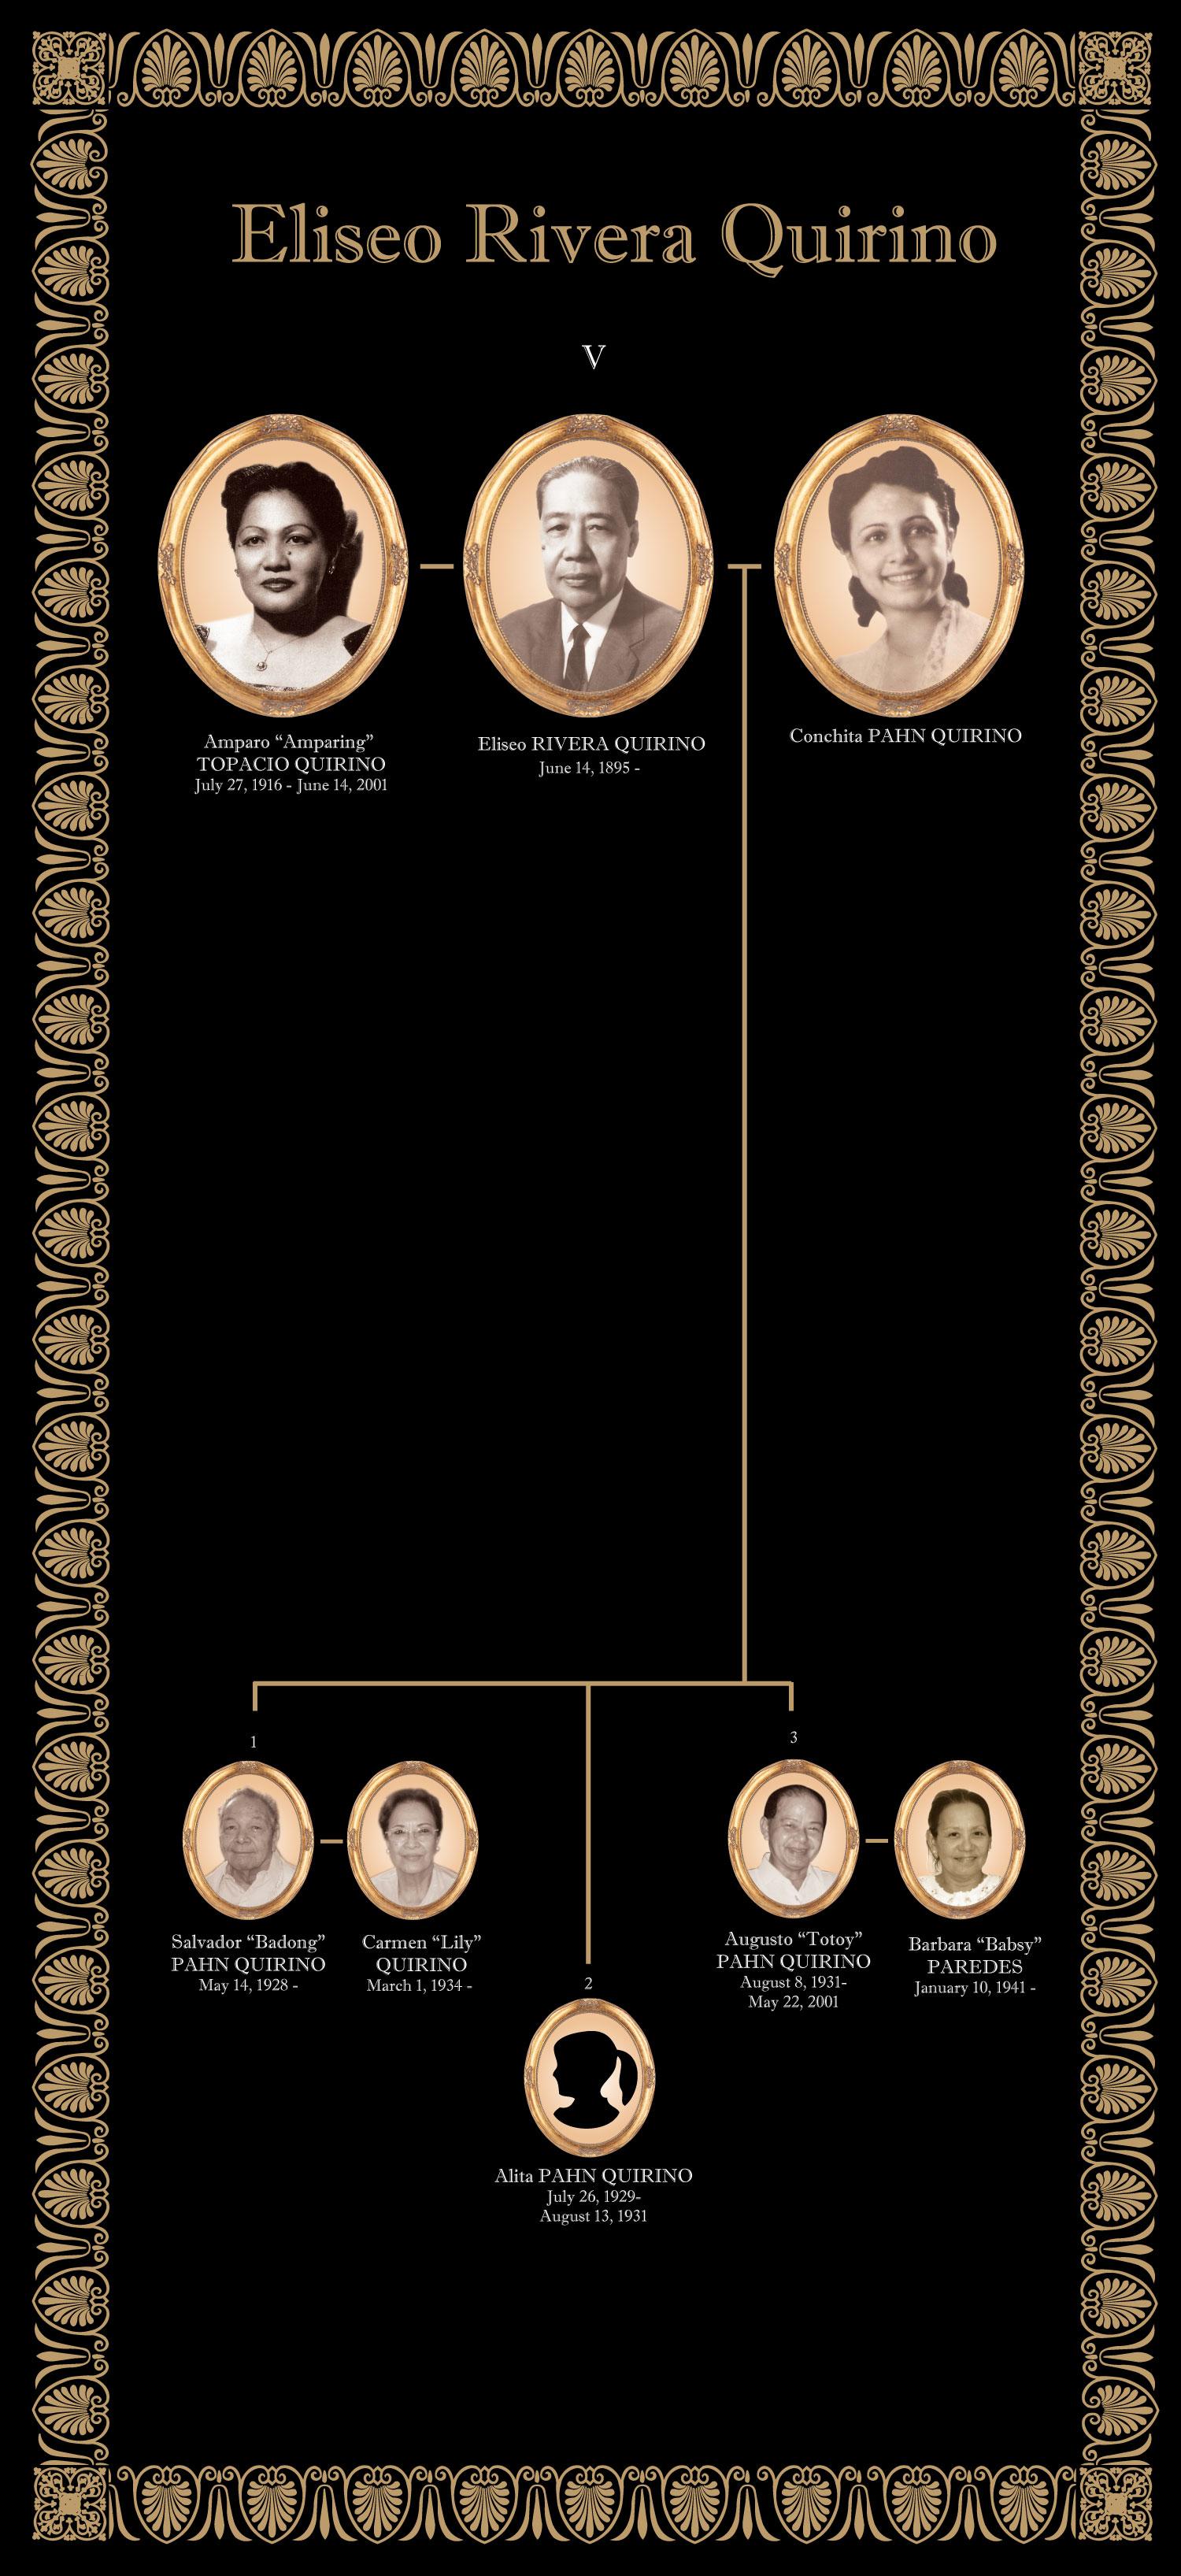 eq125_elpidio-quirino_genealogy_eliseo-quirino